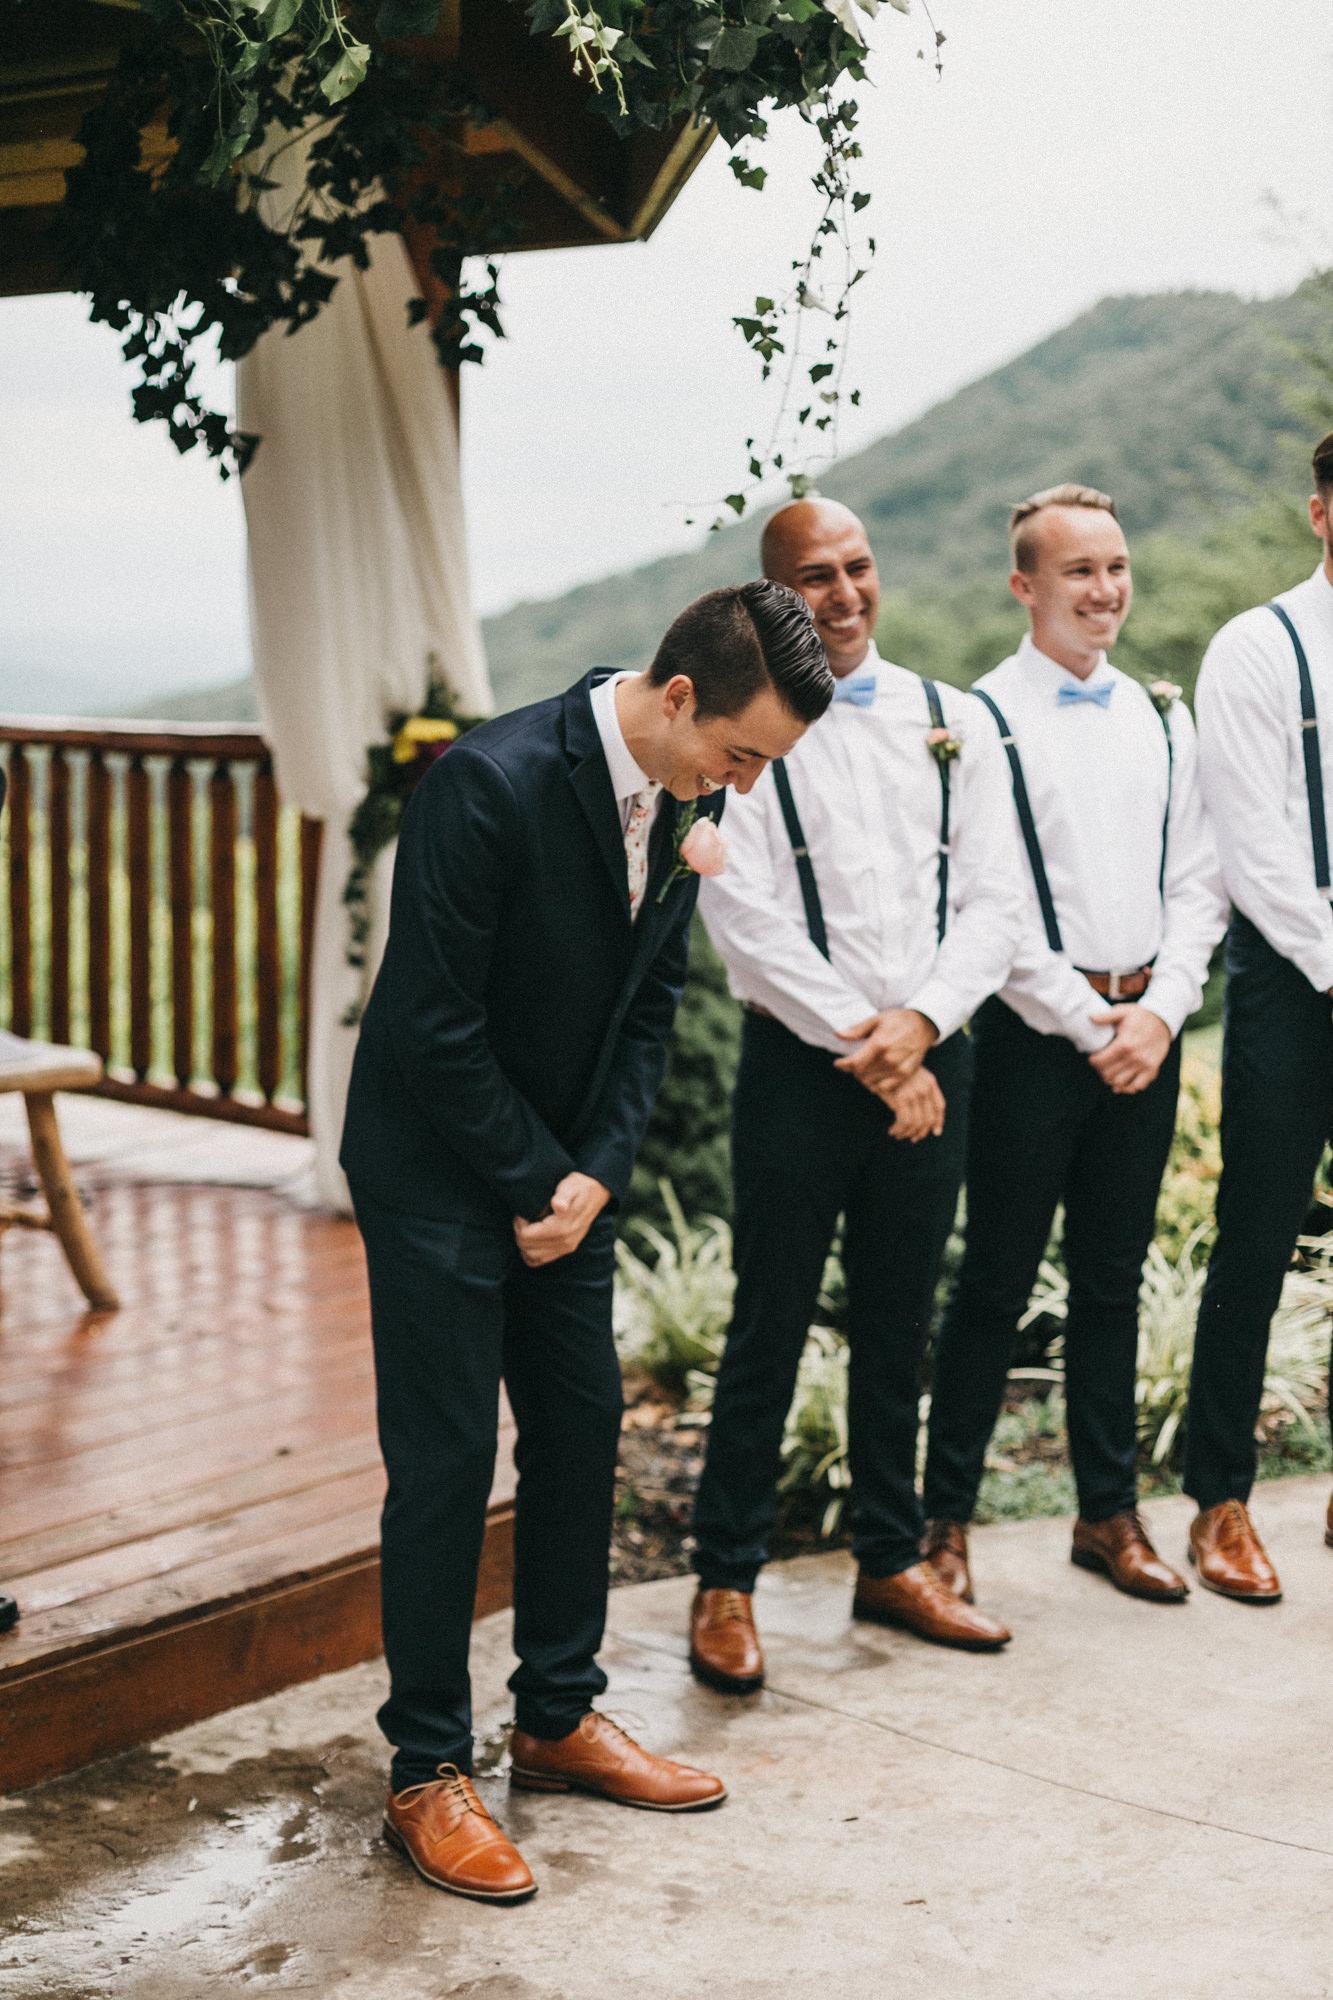 nashville_tennessee_wedding_photographer-71.jpg